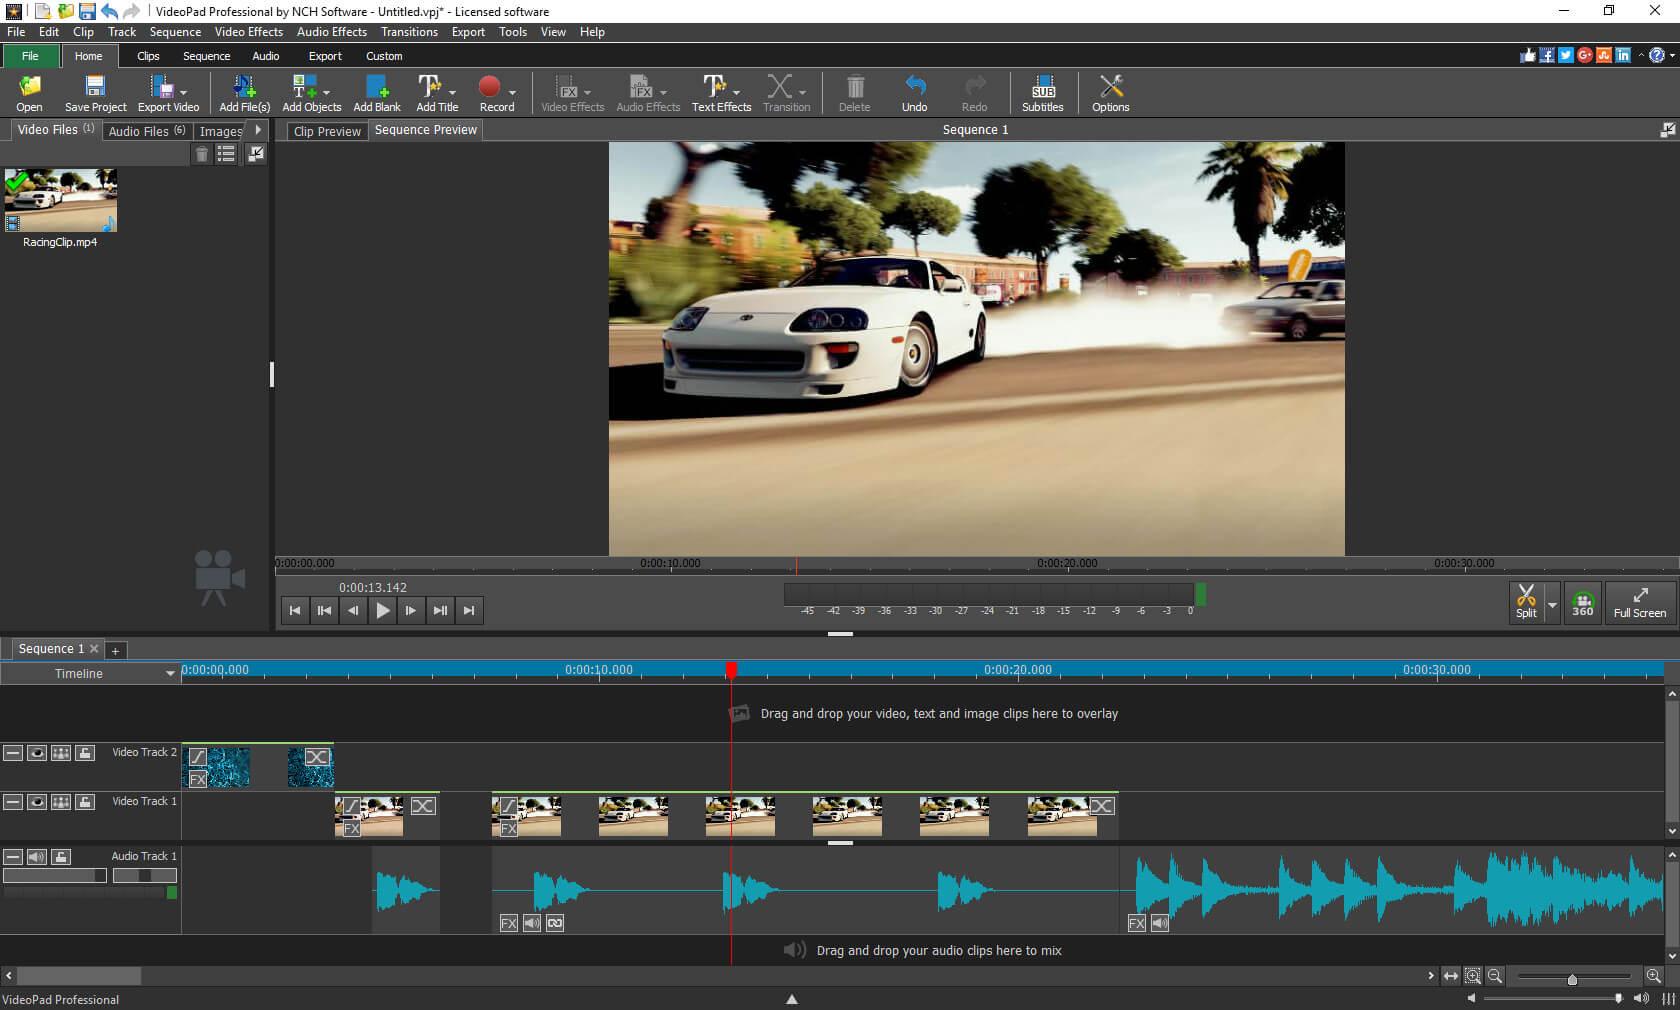 Video Pad editor